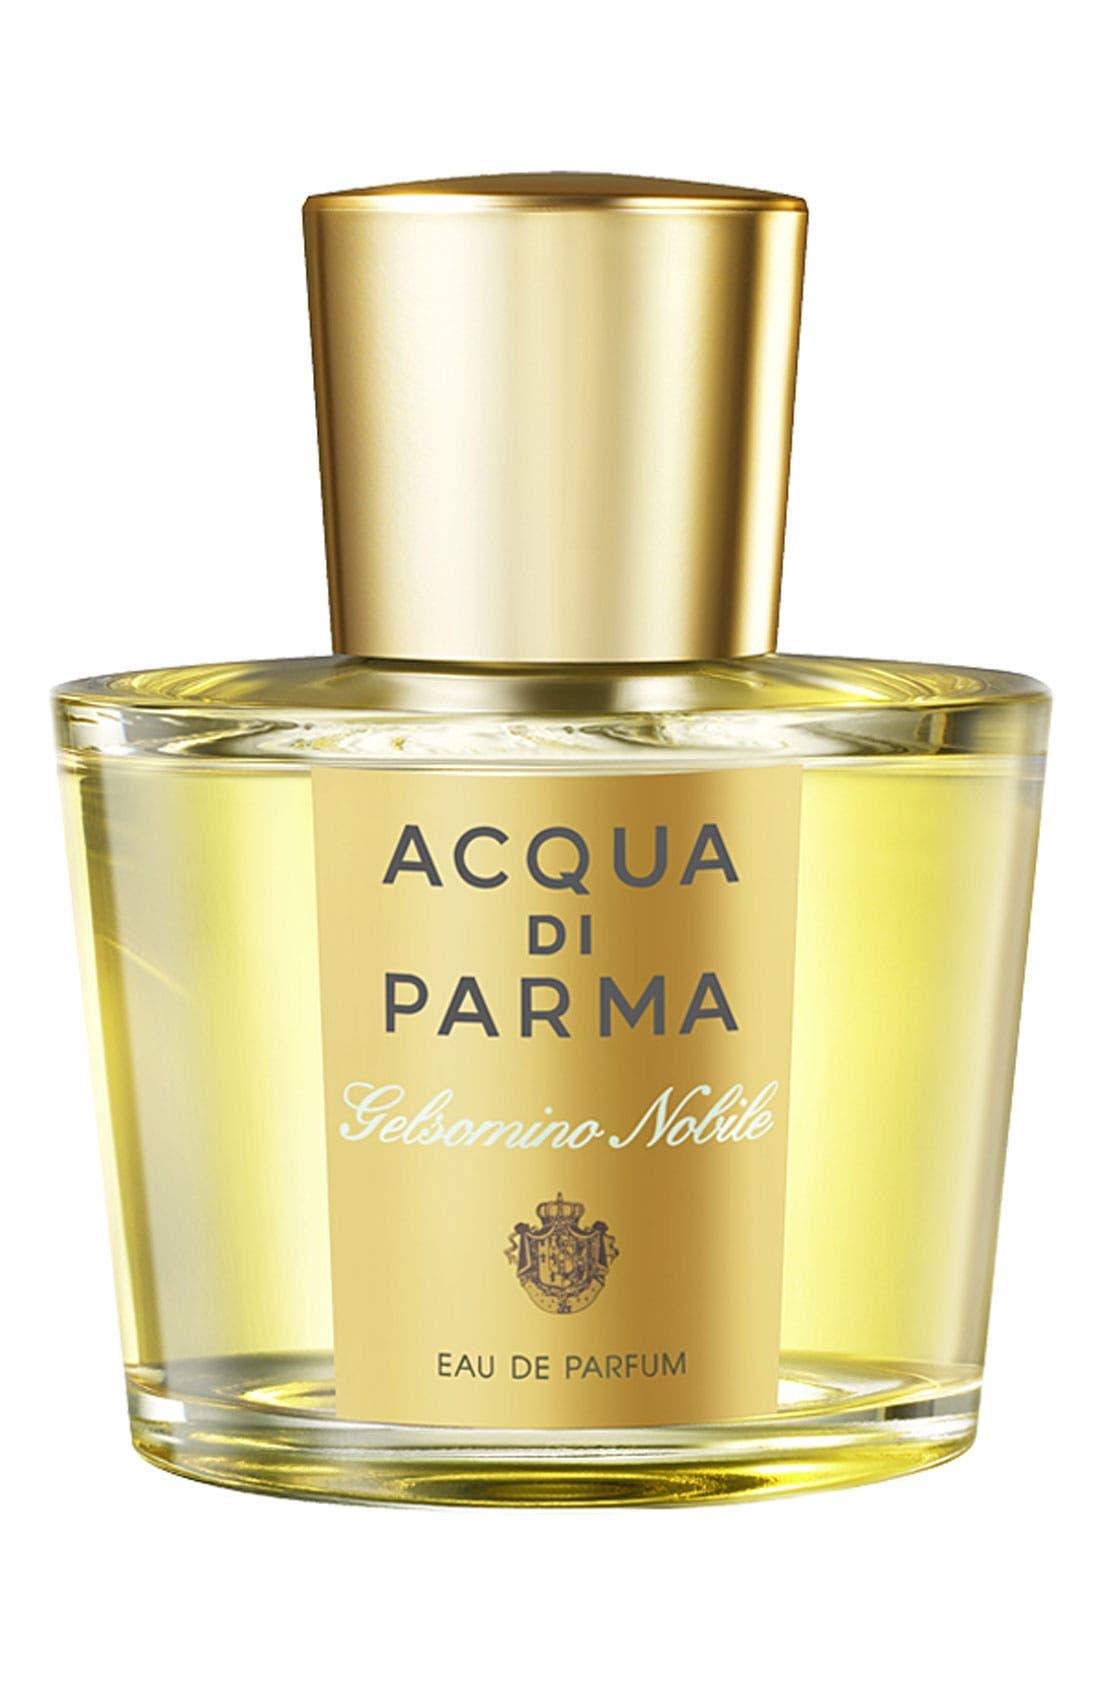 Acqua di Parma 'Gelsomino Nobile' Eau de Parfum